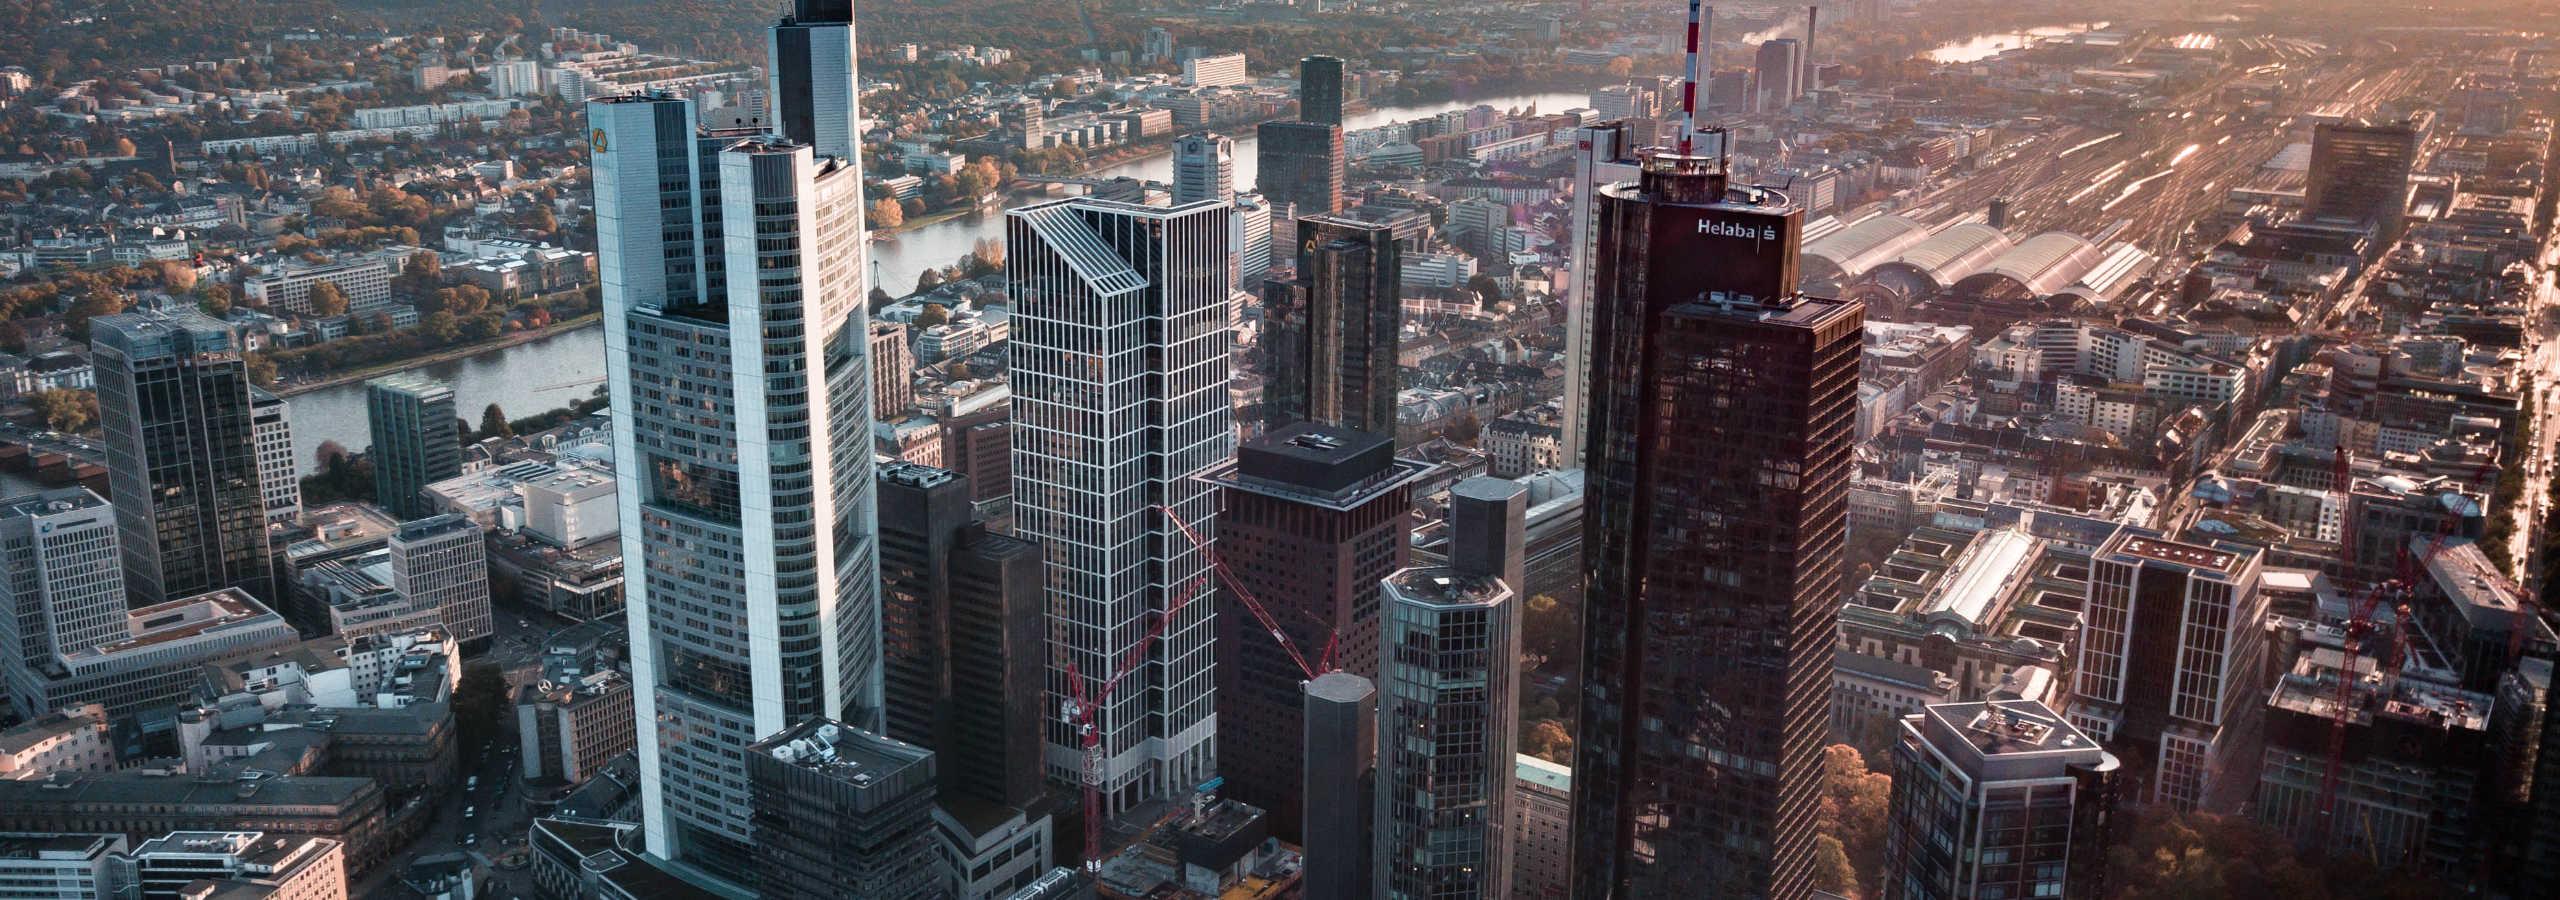 Foto: aerial view of city during daytime © Jan-Philipp Thiele / Unsplash - https://unsplash.com/photos/GfpzJyfudE8